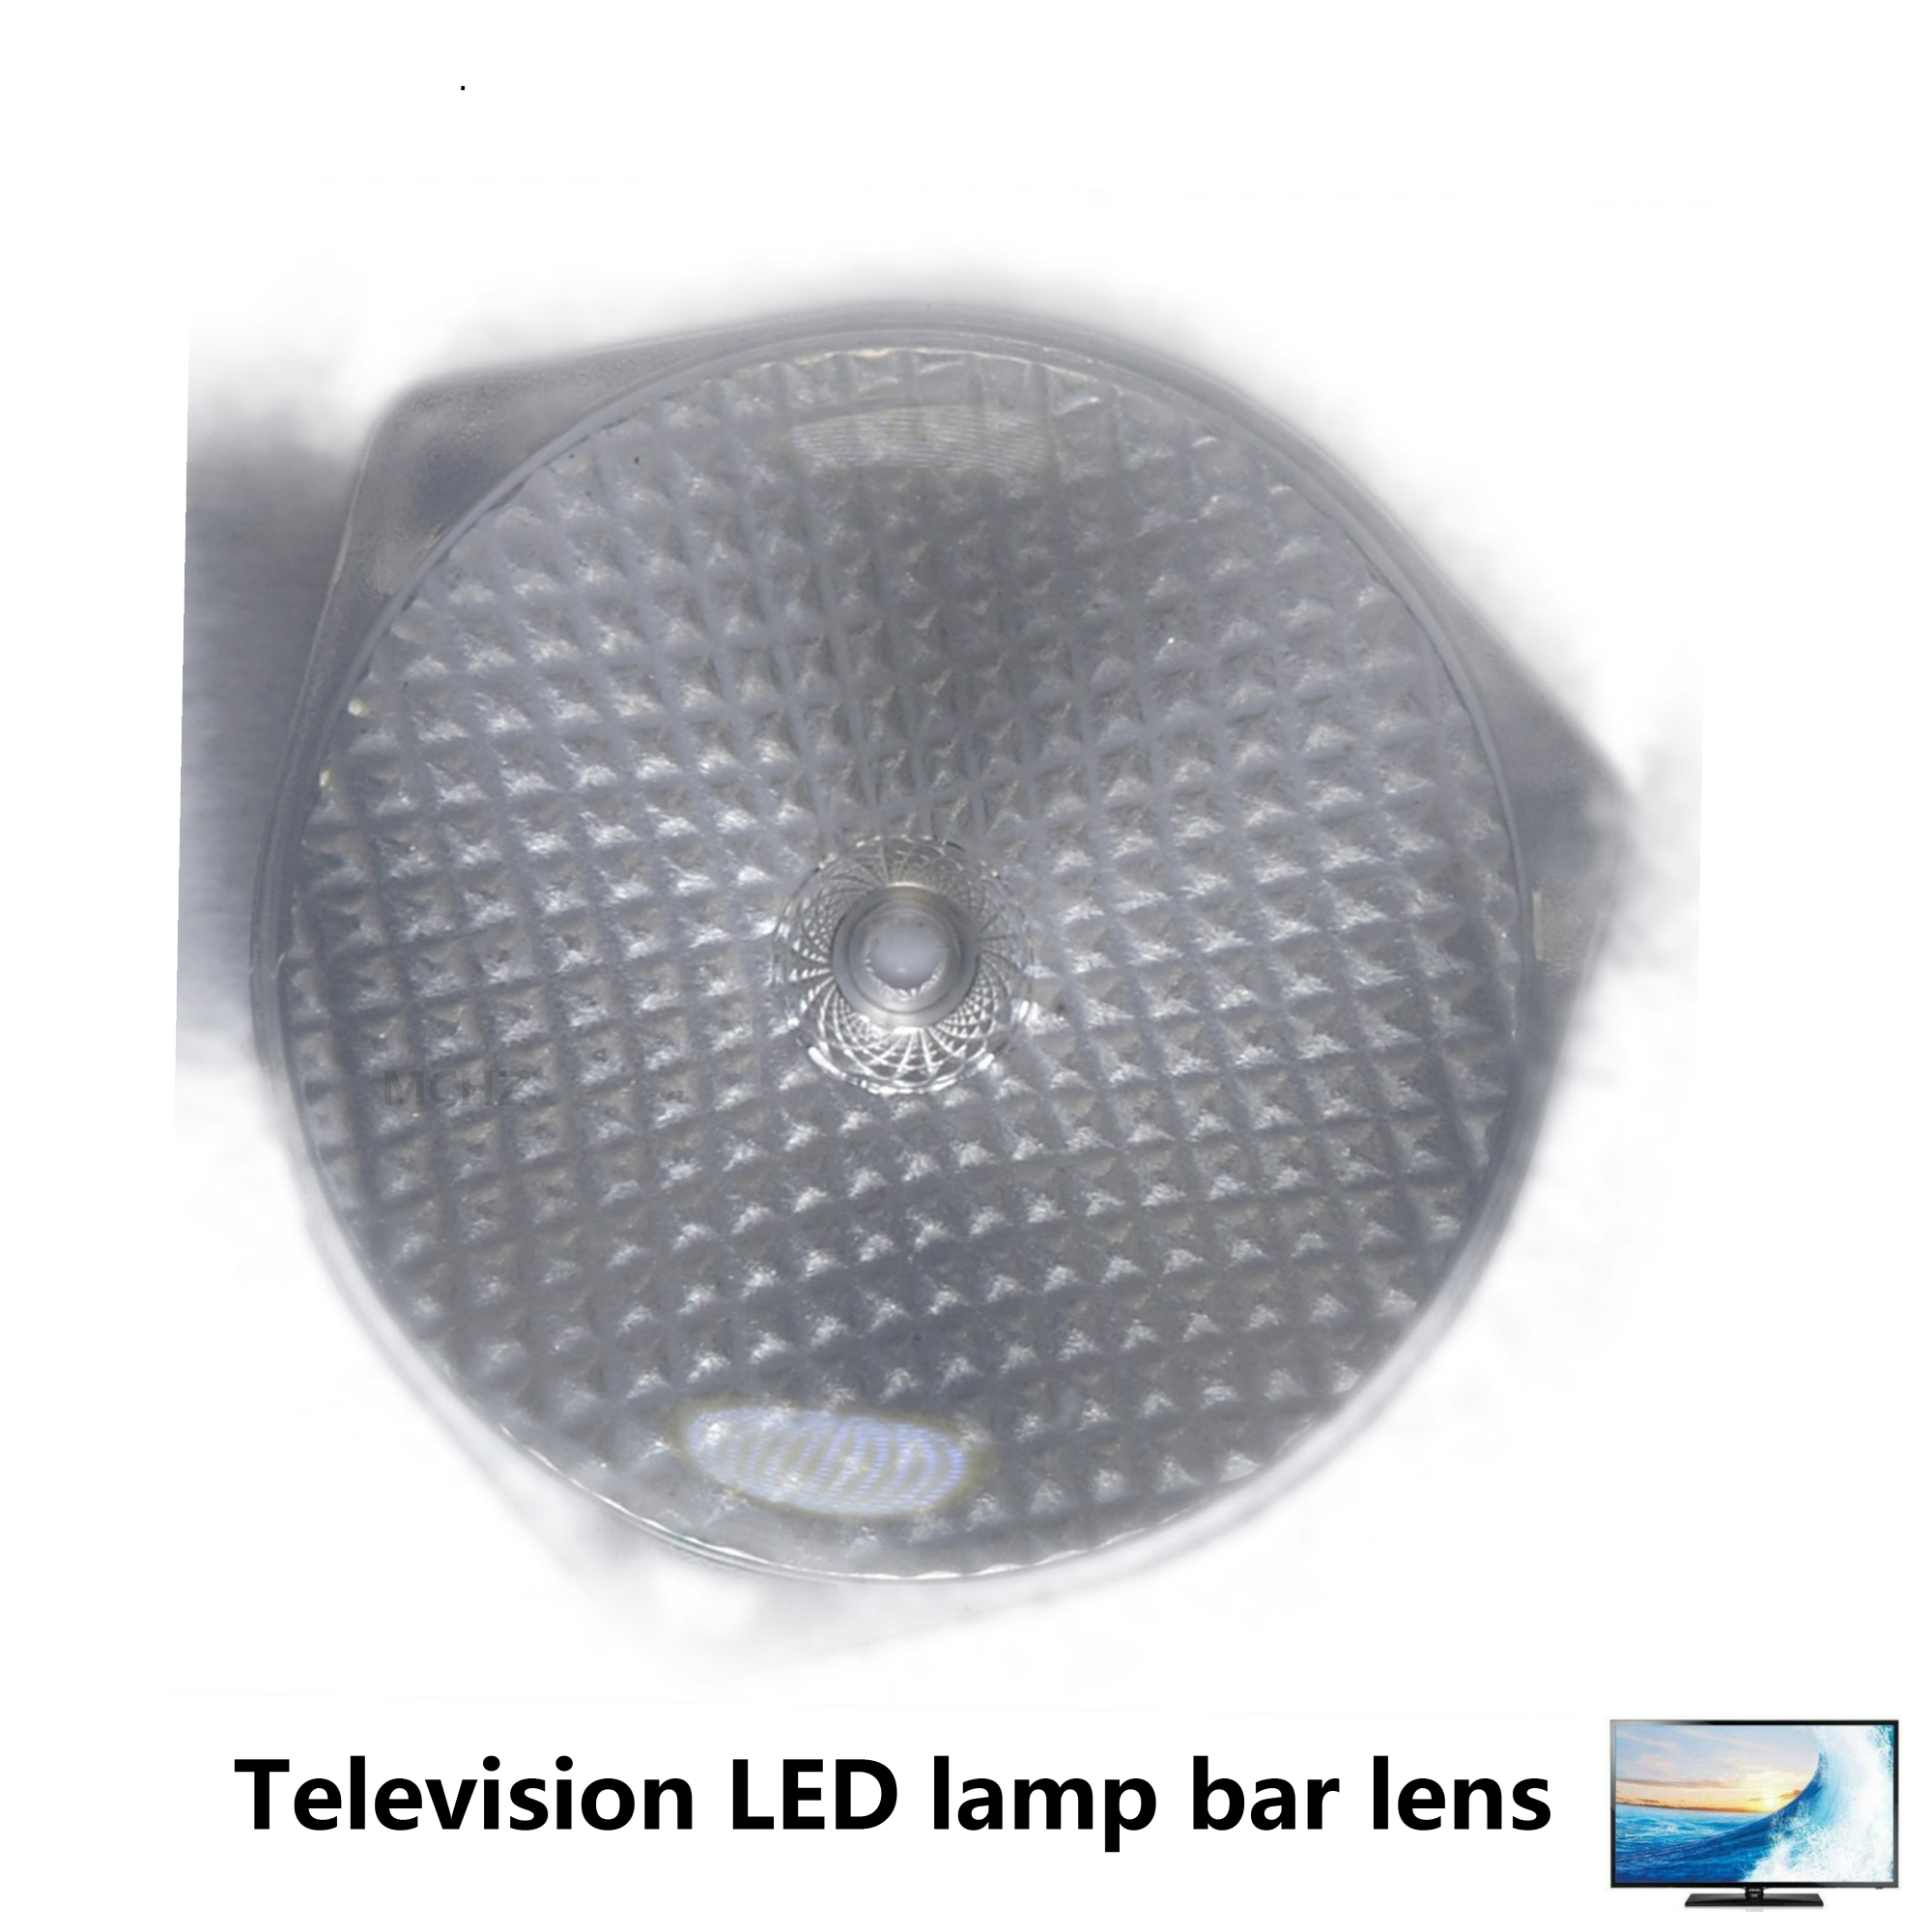 60pcs FOR Maintenance Konka Skyworth Changhong Hisense LG Samsung TCL LCD TV LED Backlight Optical Lens 2835 3528 3030 3228 2828